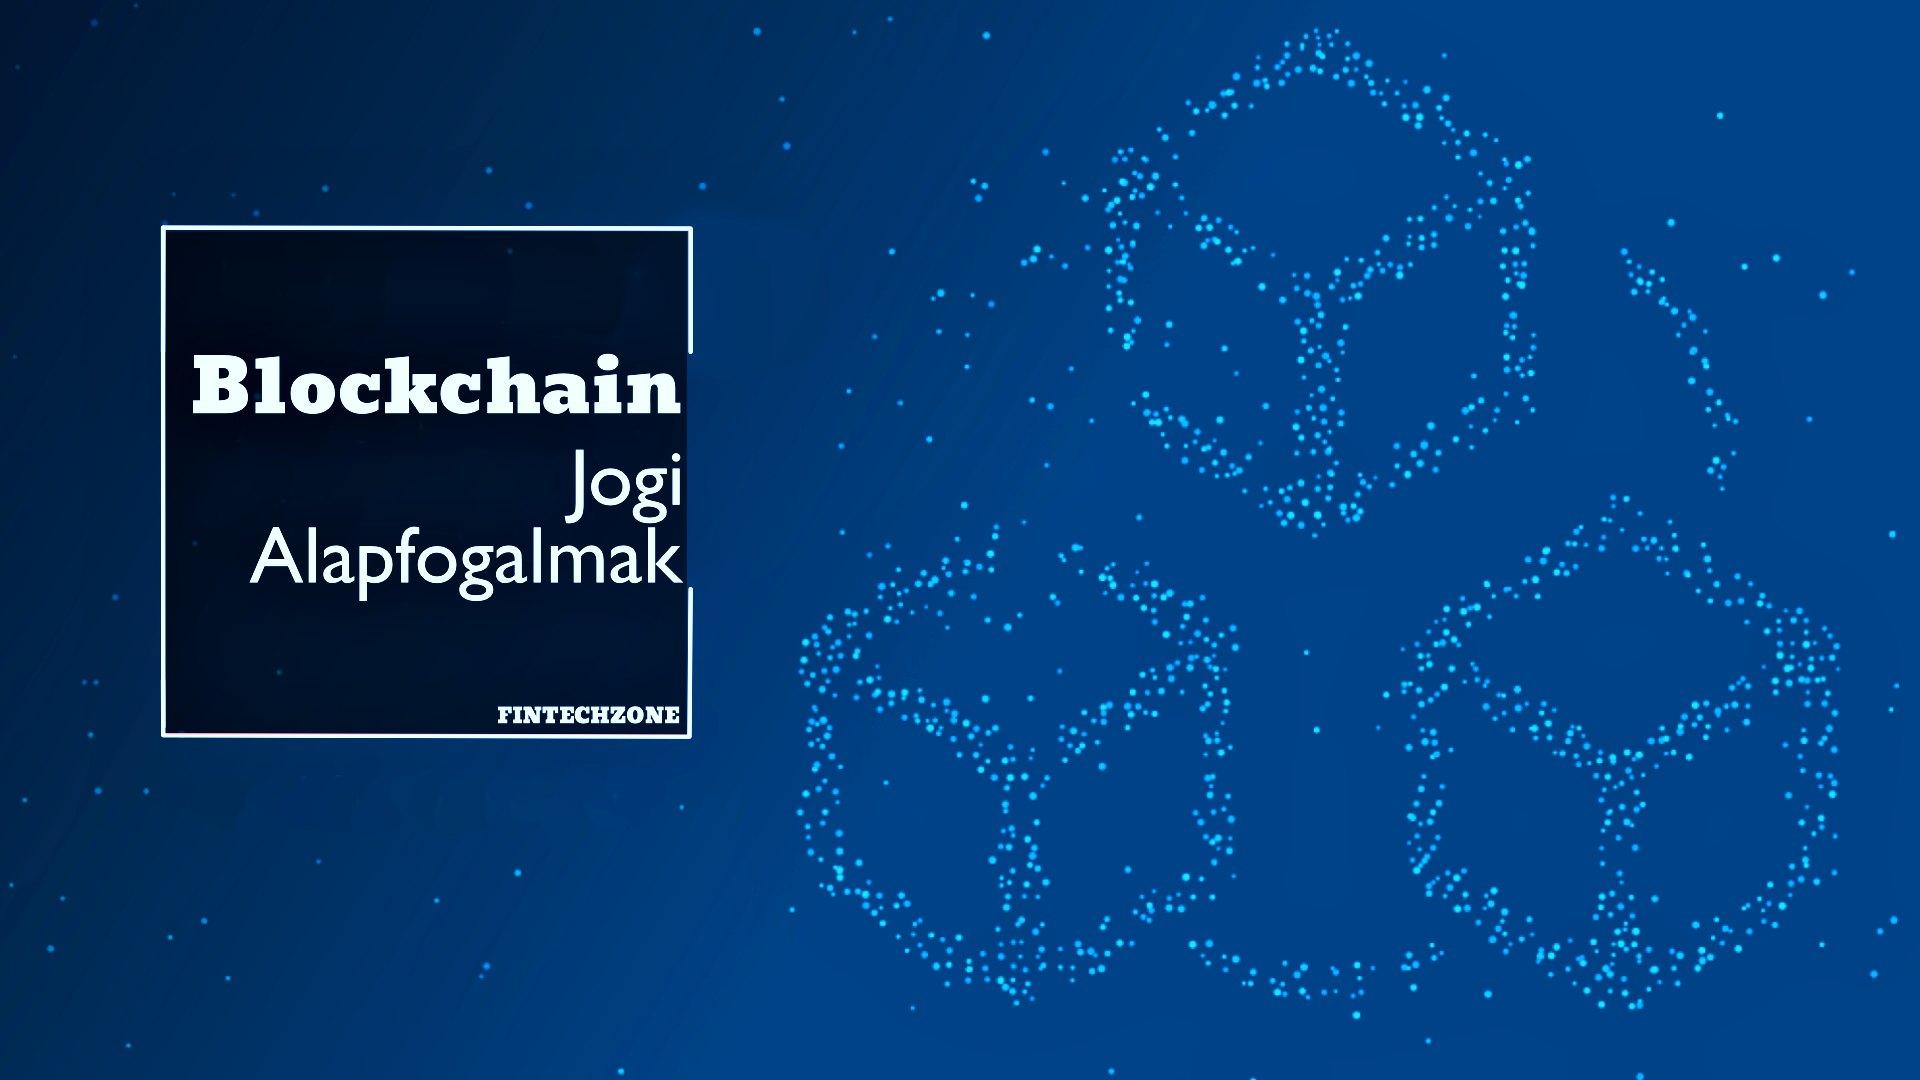 blockchain jogi alapfogalmak